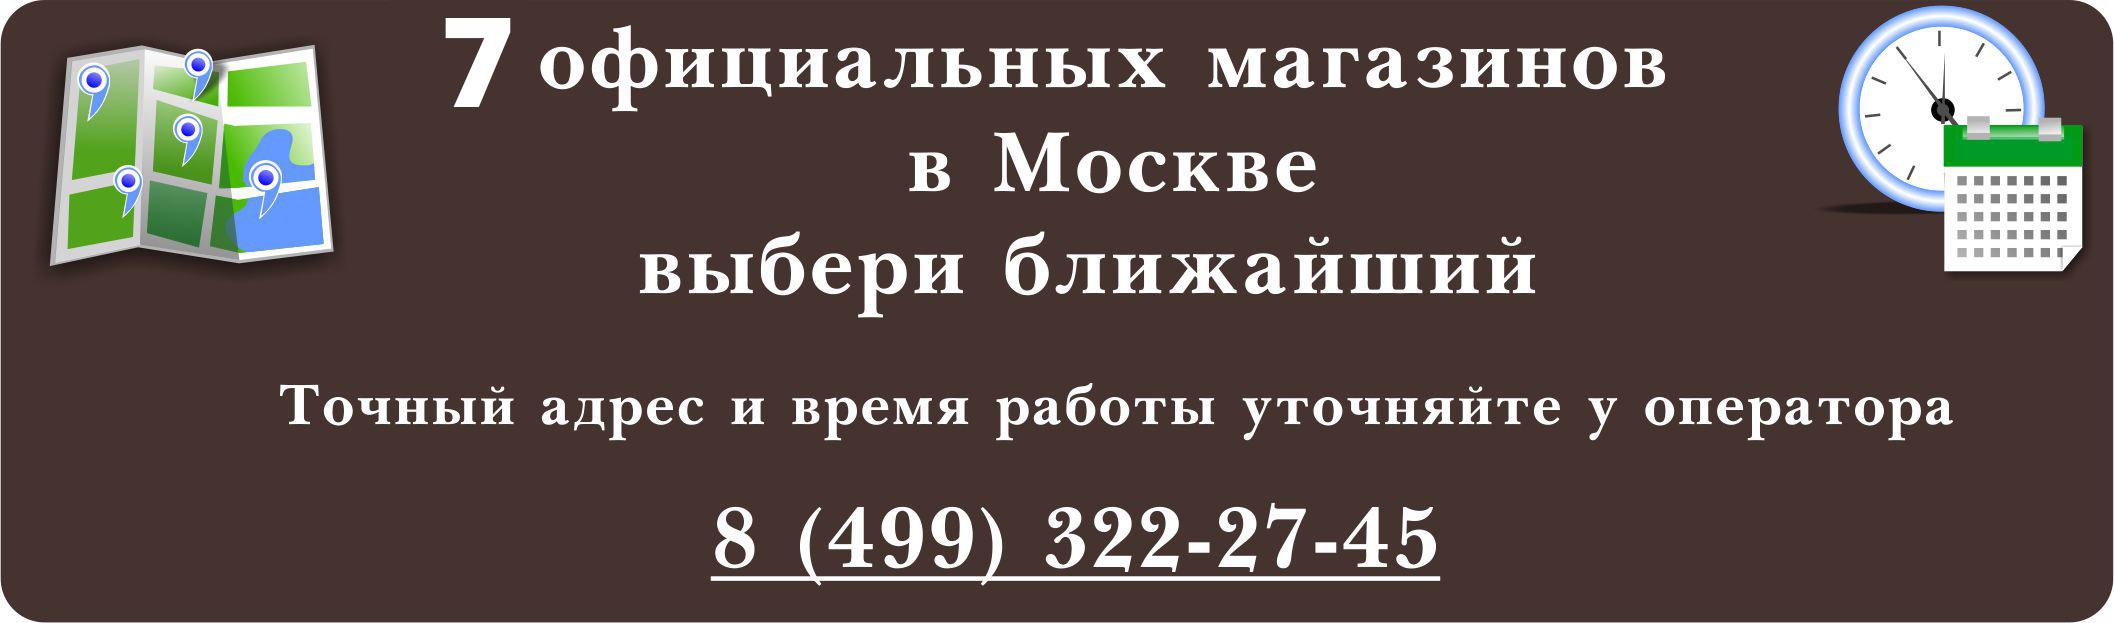 http://dveriulyanovskie.ru/images/upload/contact-banner2.jpg